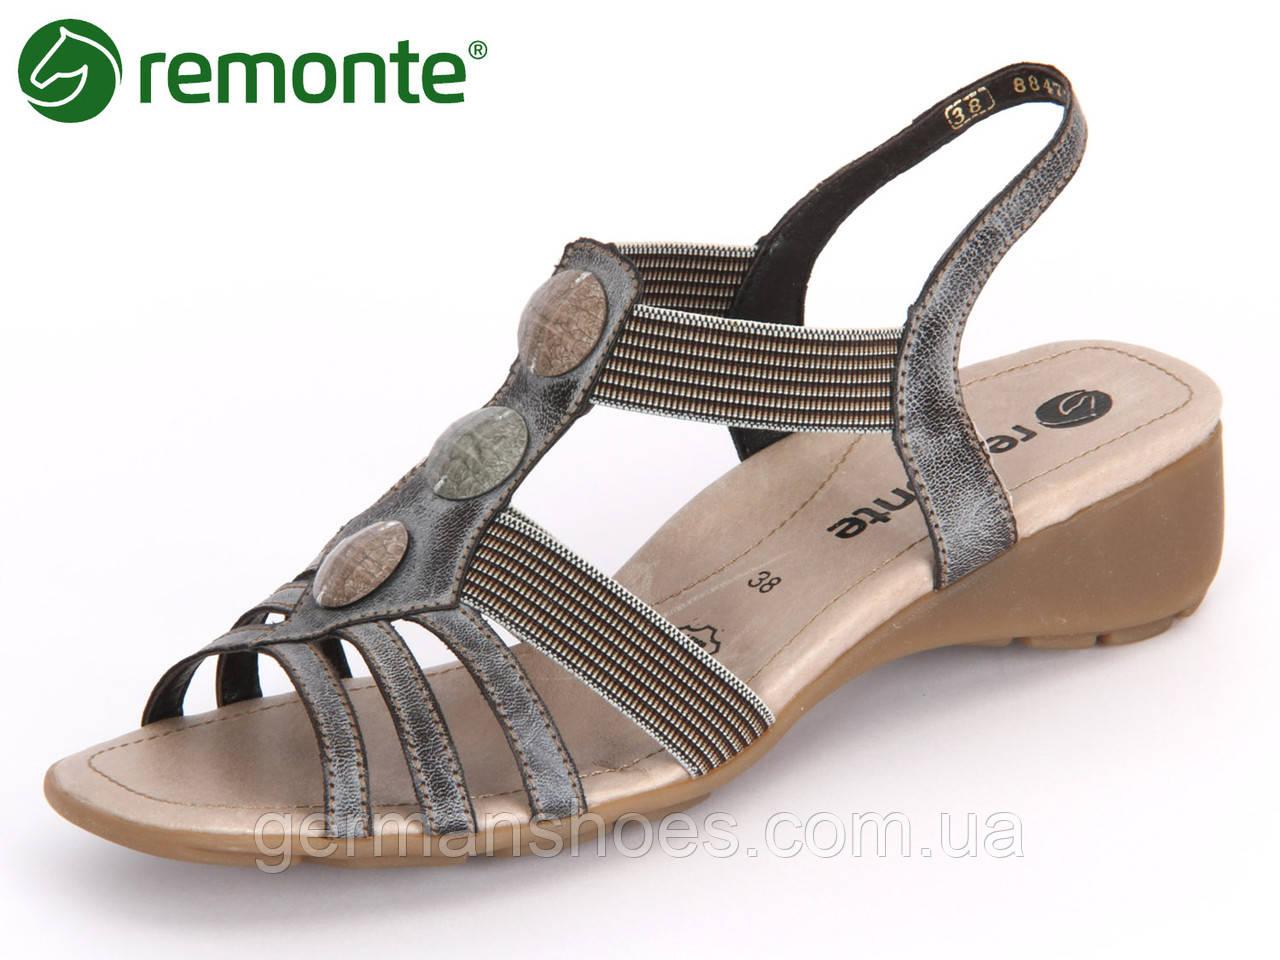 Босоножки женские Remonte R5258-15